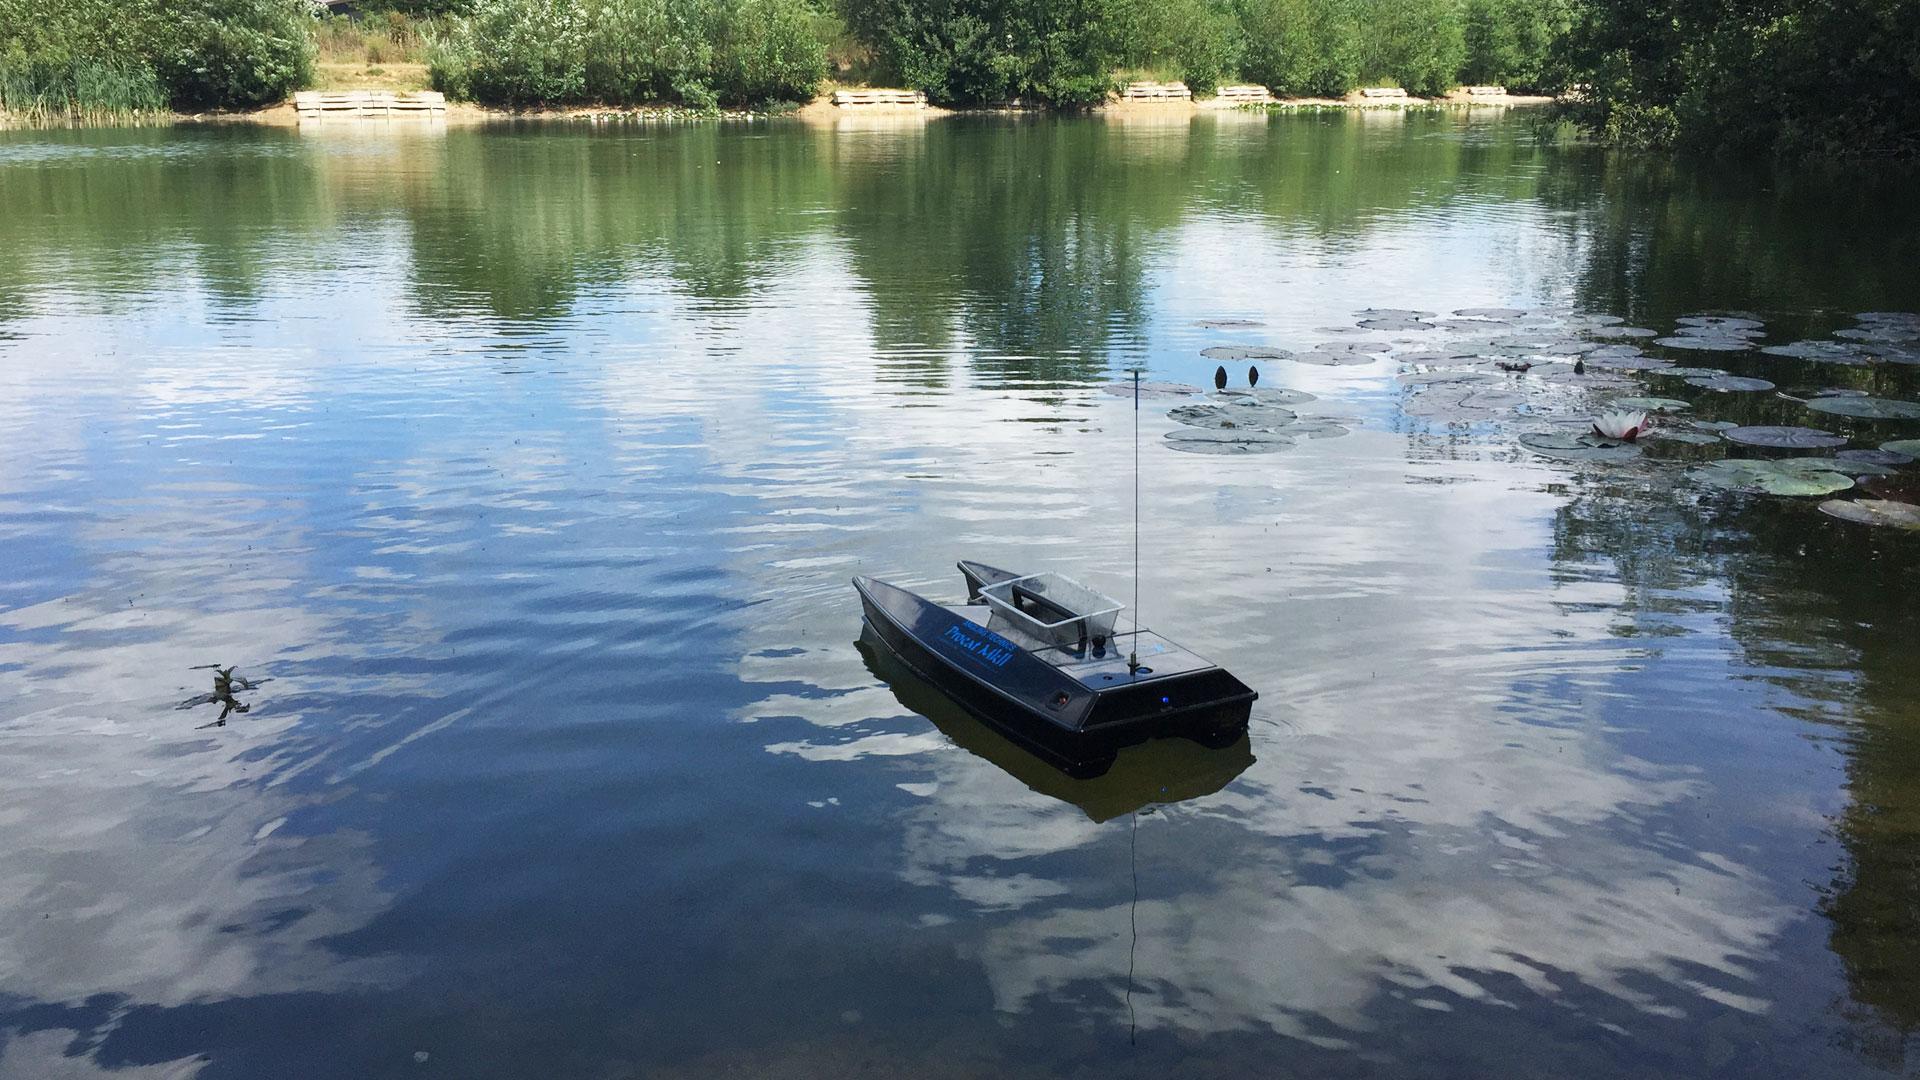 Carp Fishing England | Exclusive Carp Fishing Lake Fishing Holidays Marlow Uk